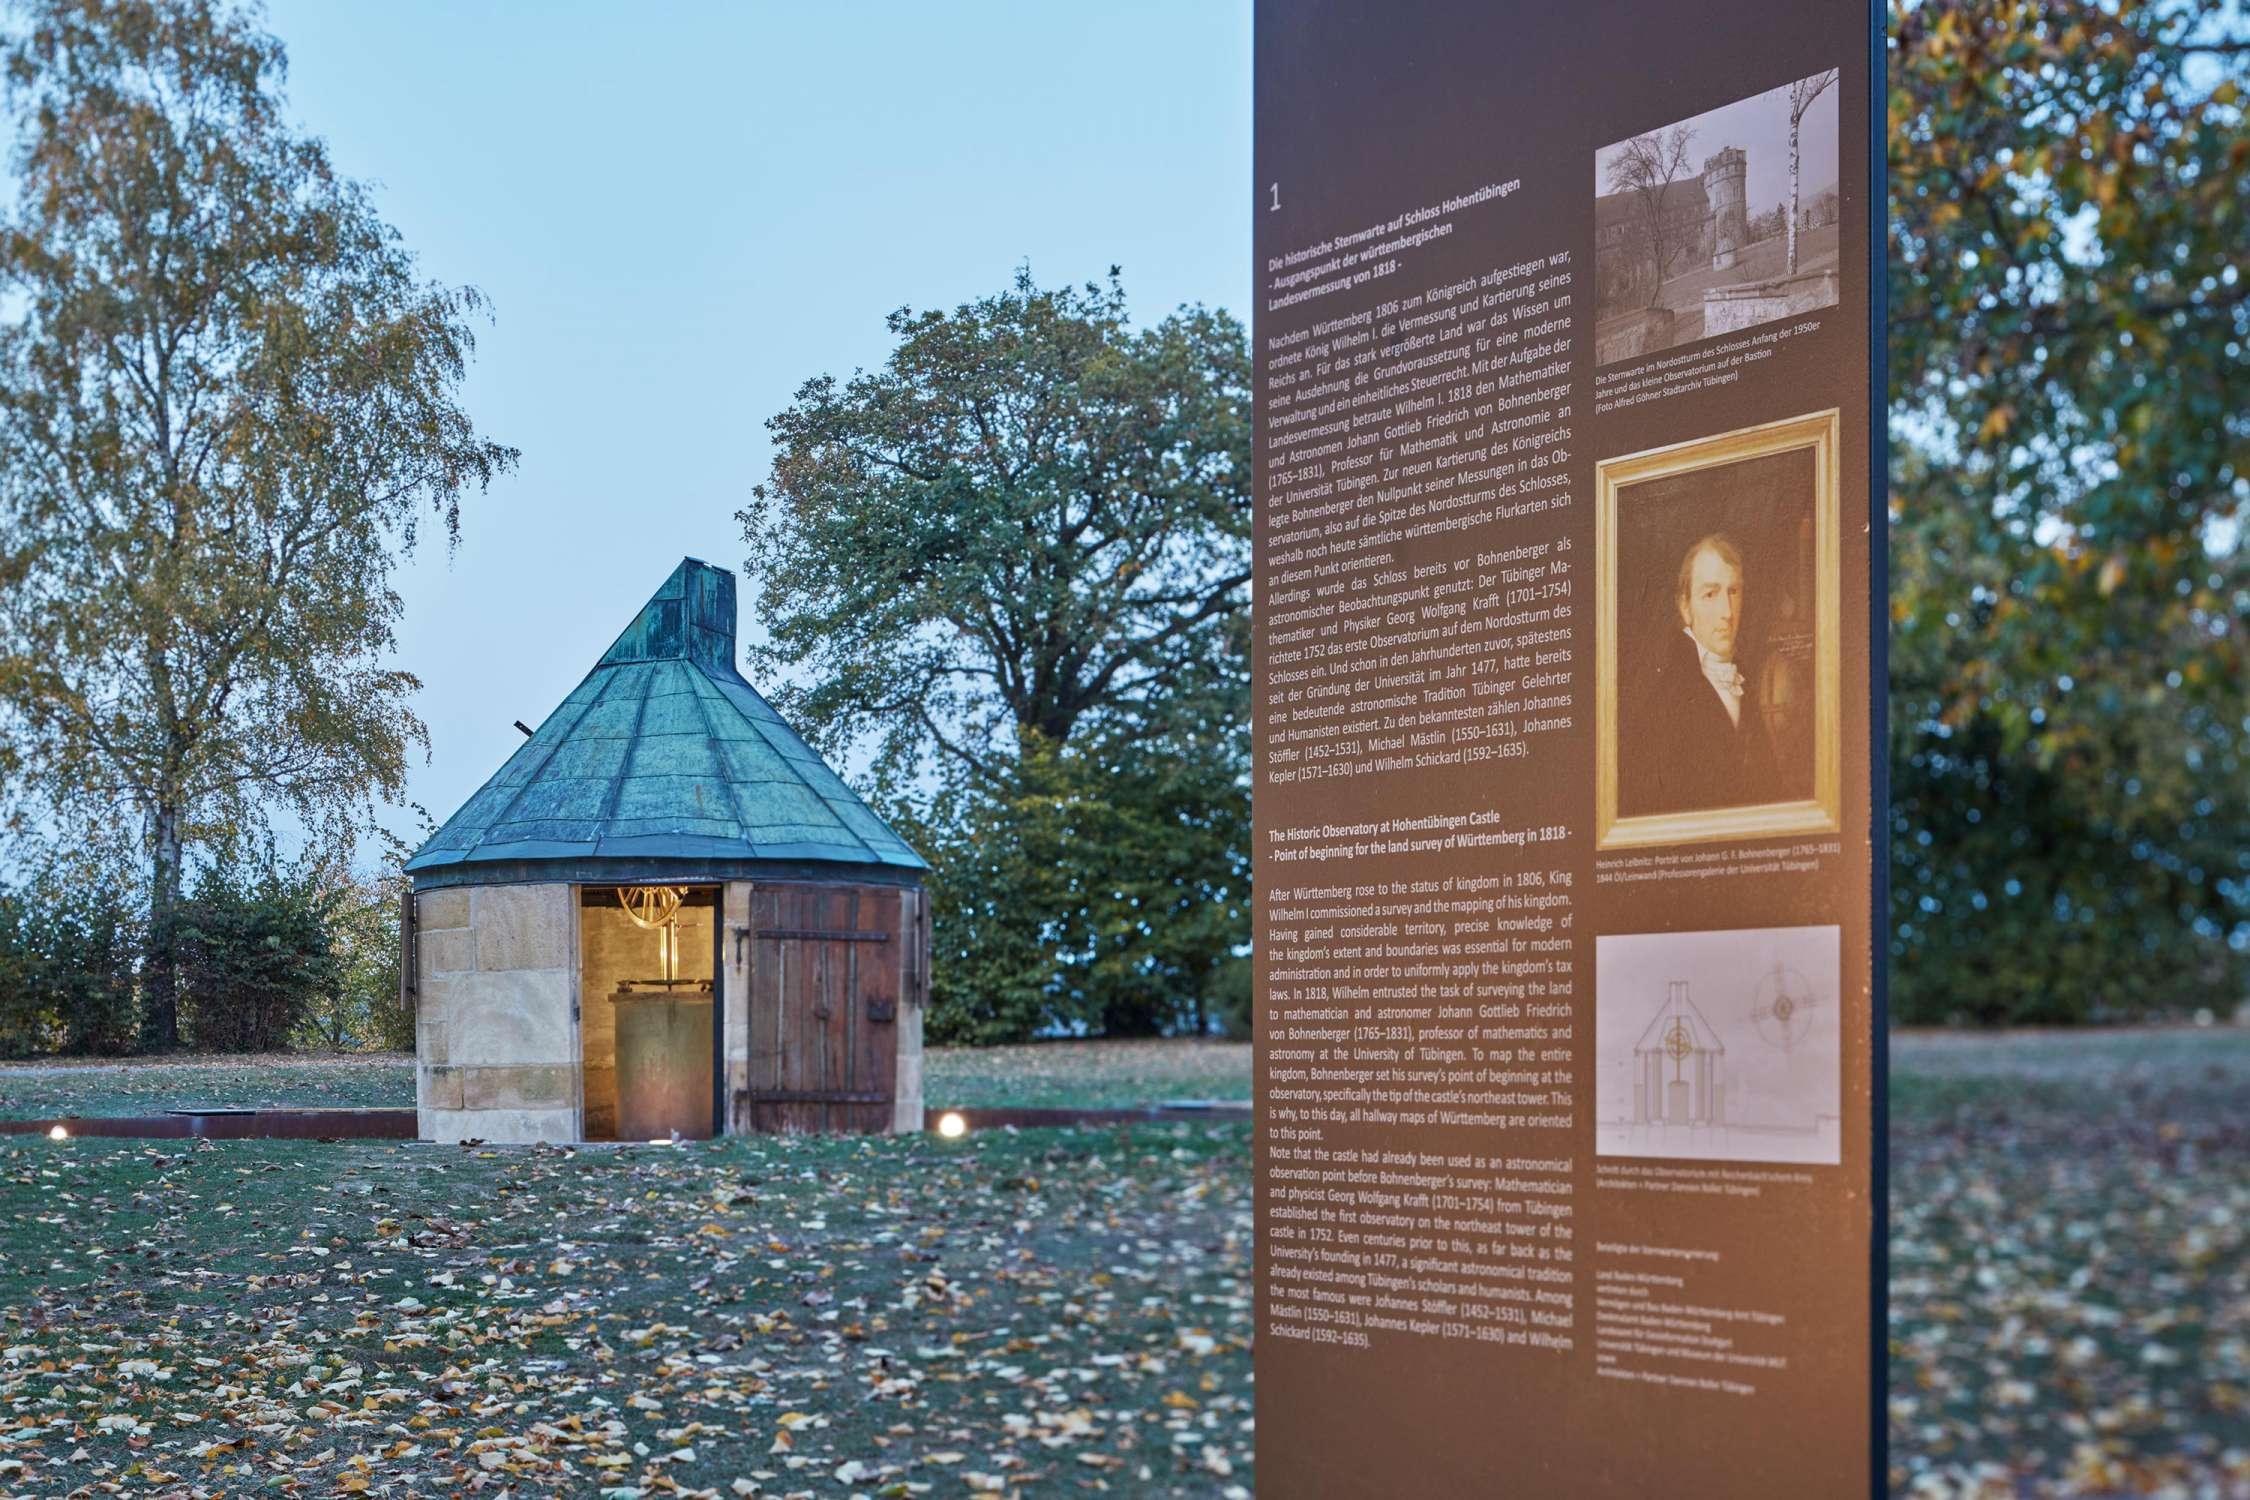 Johann Gottlieb Friedrich Bohnenberger Observatorium, Schloss Hohentübingen (4)